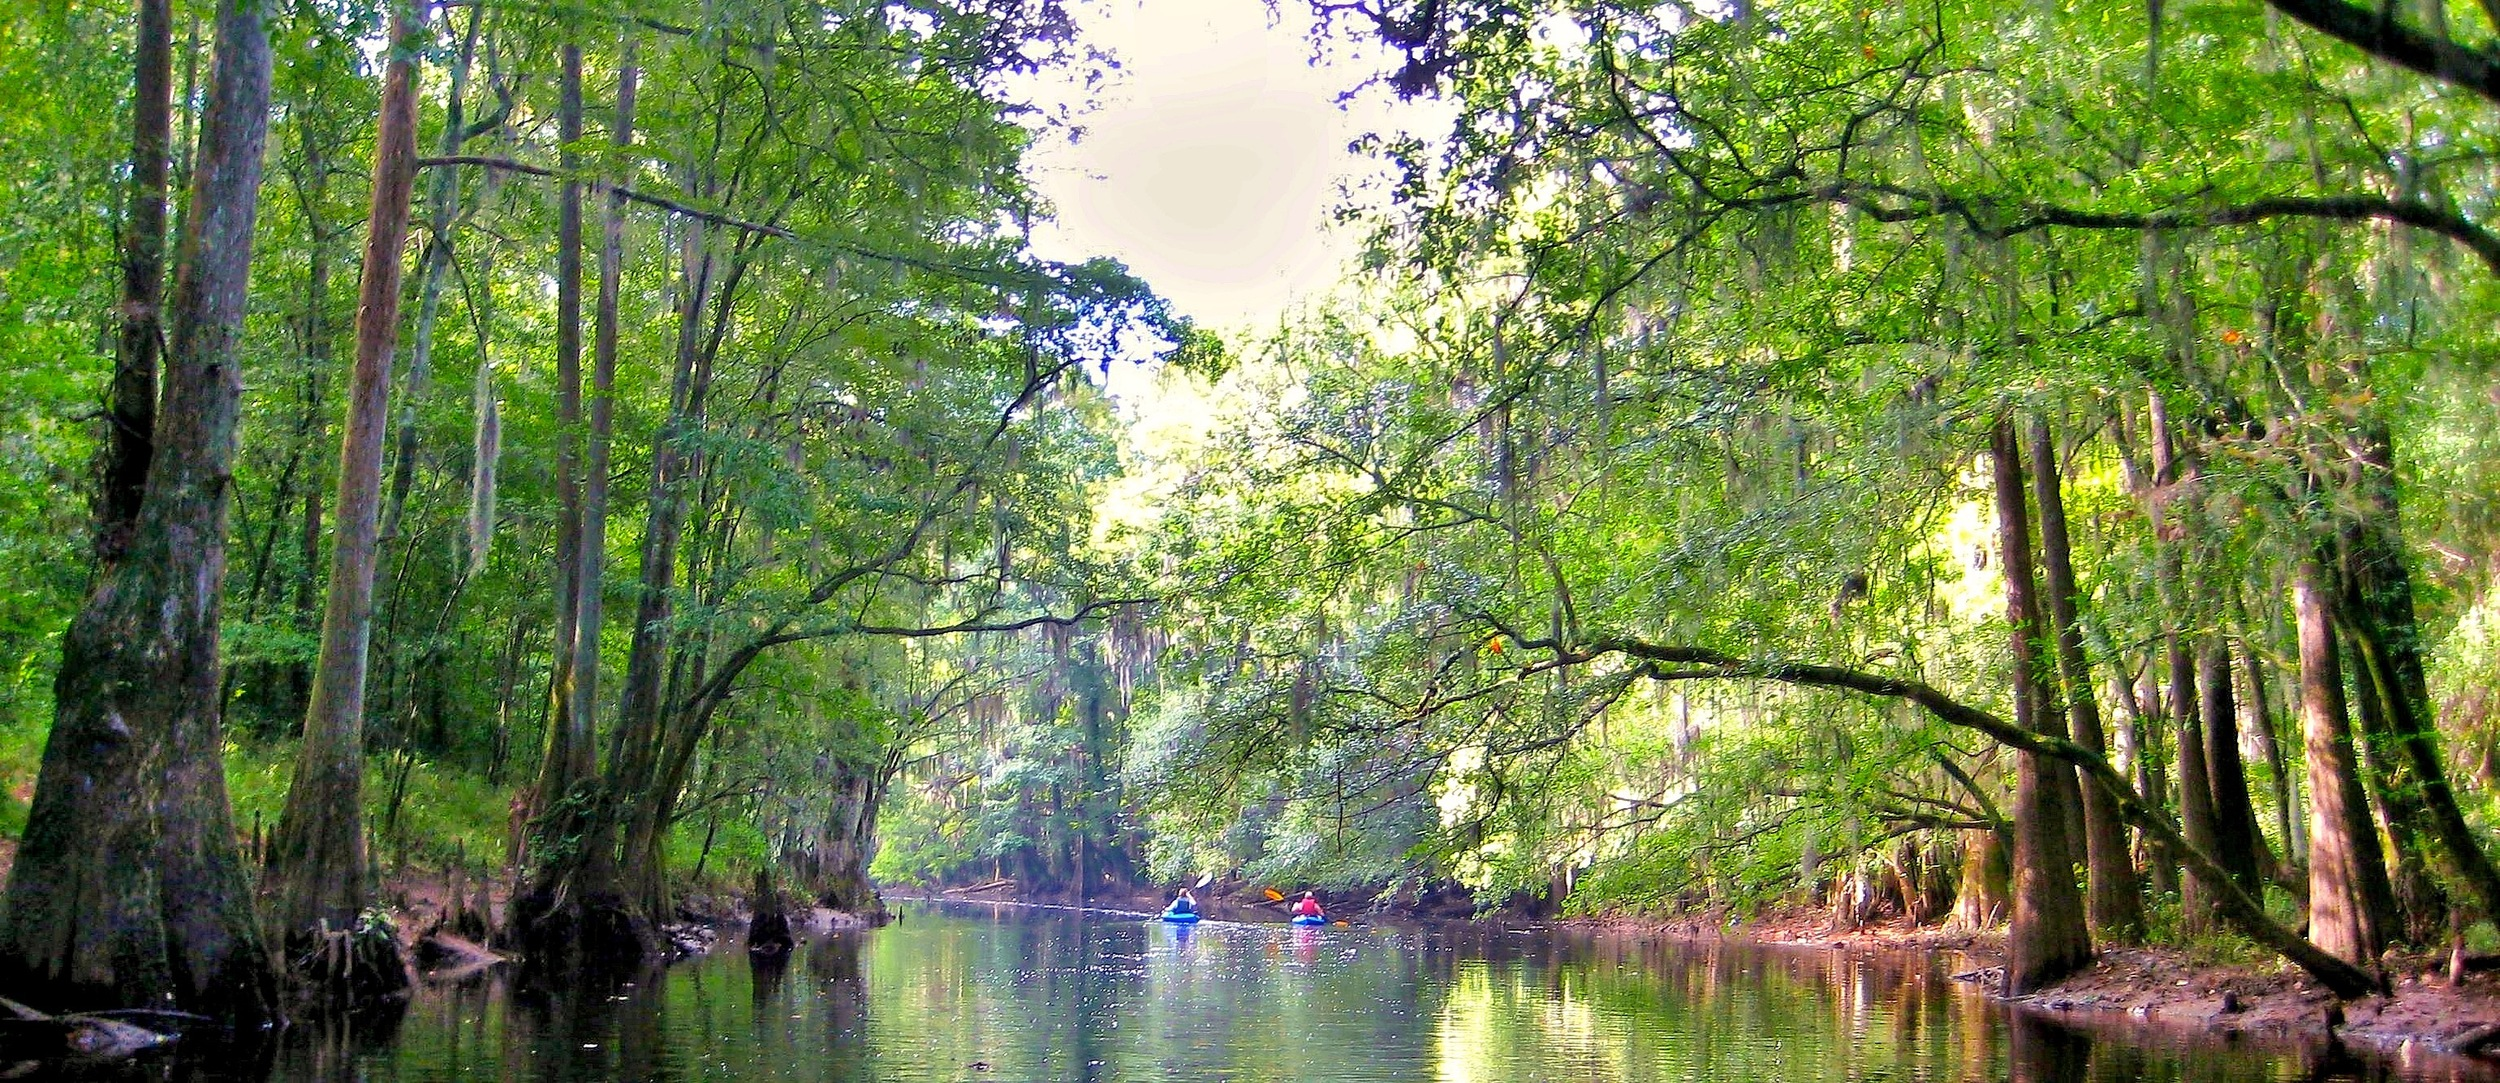 Congaree National Park, near Hopkins, South Carolina